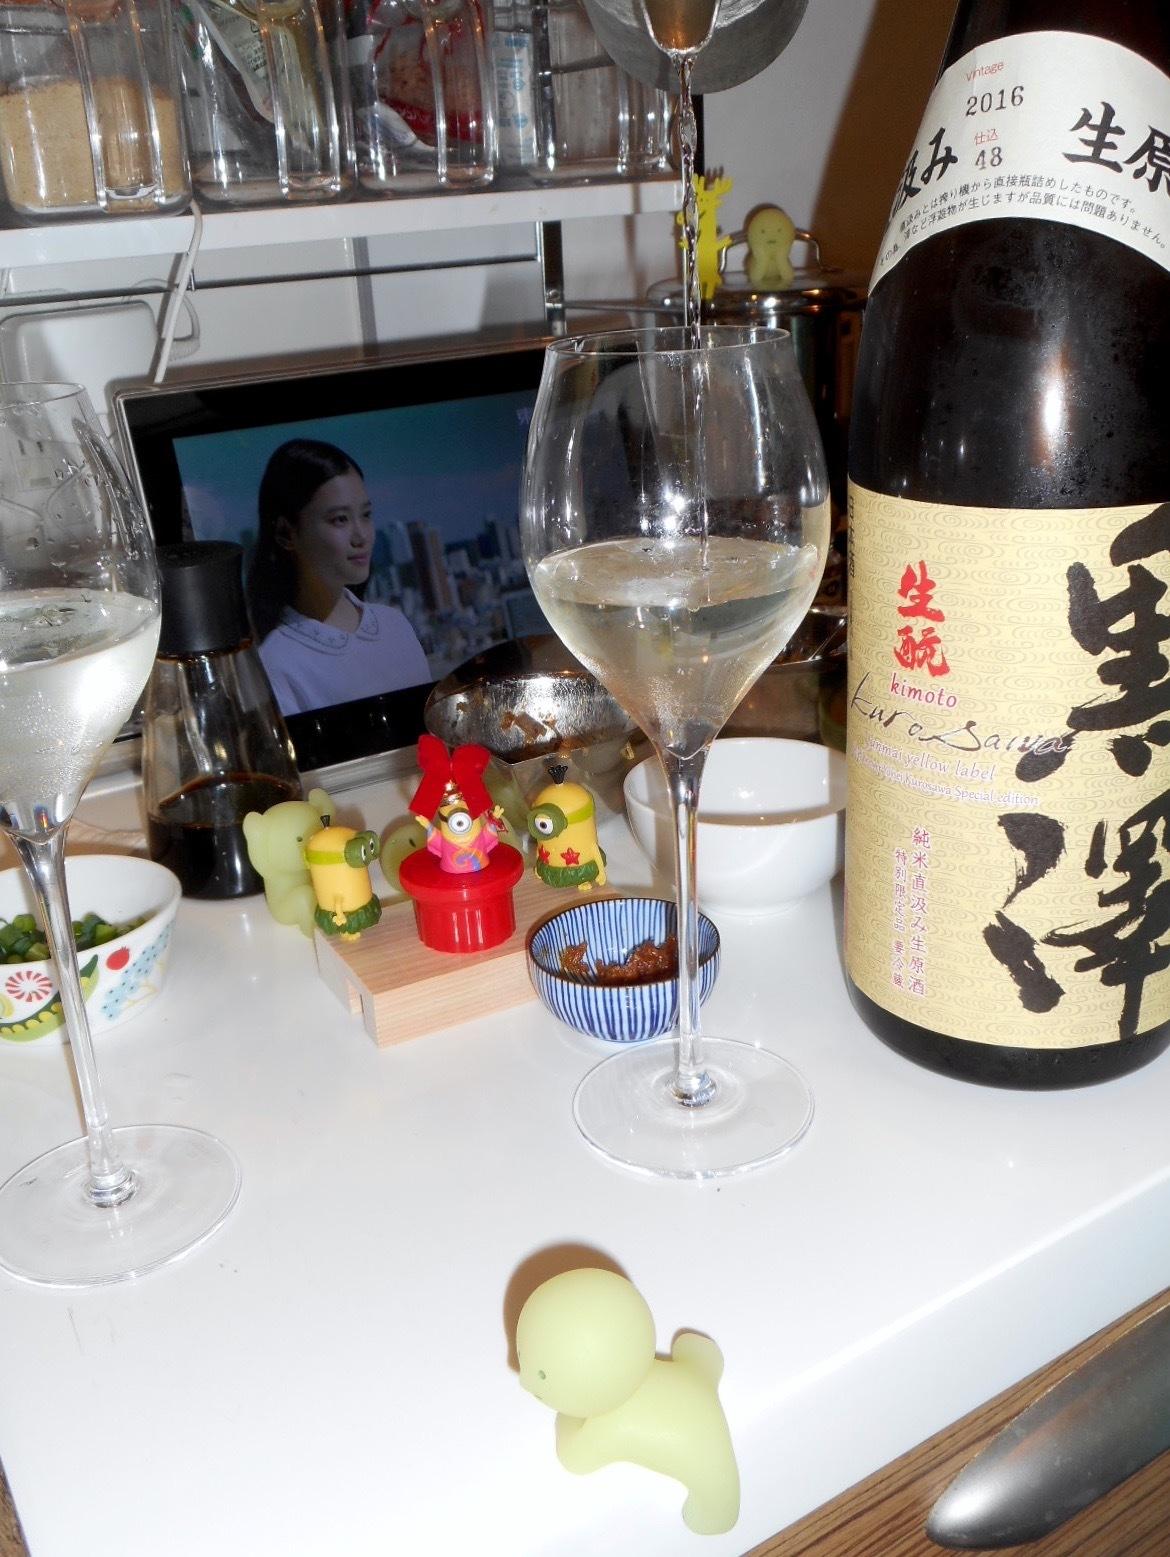 kurosawa_jikagumi_yellow28by16.jpg